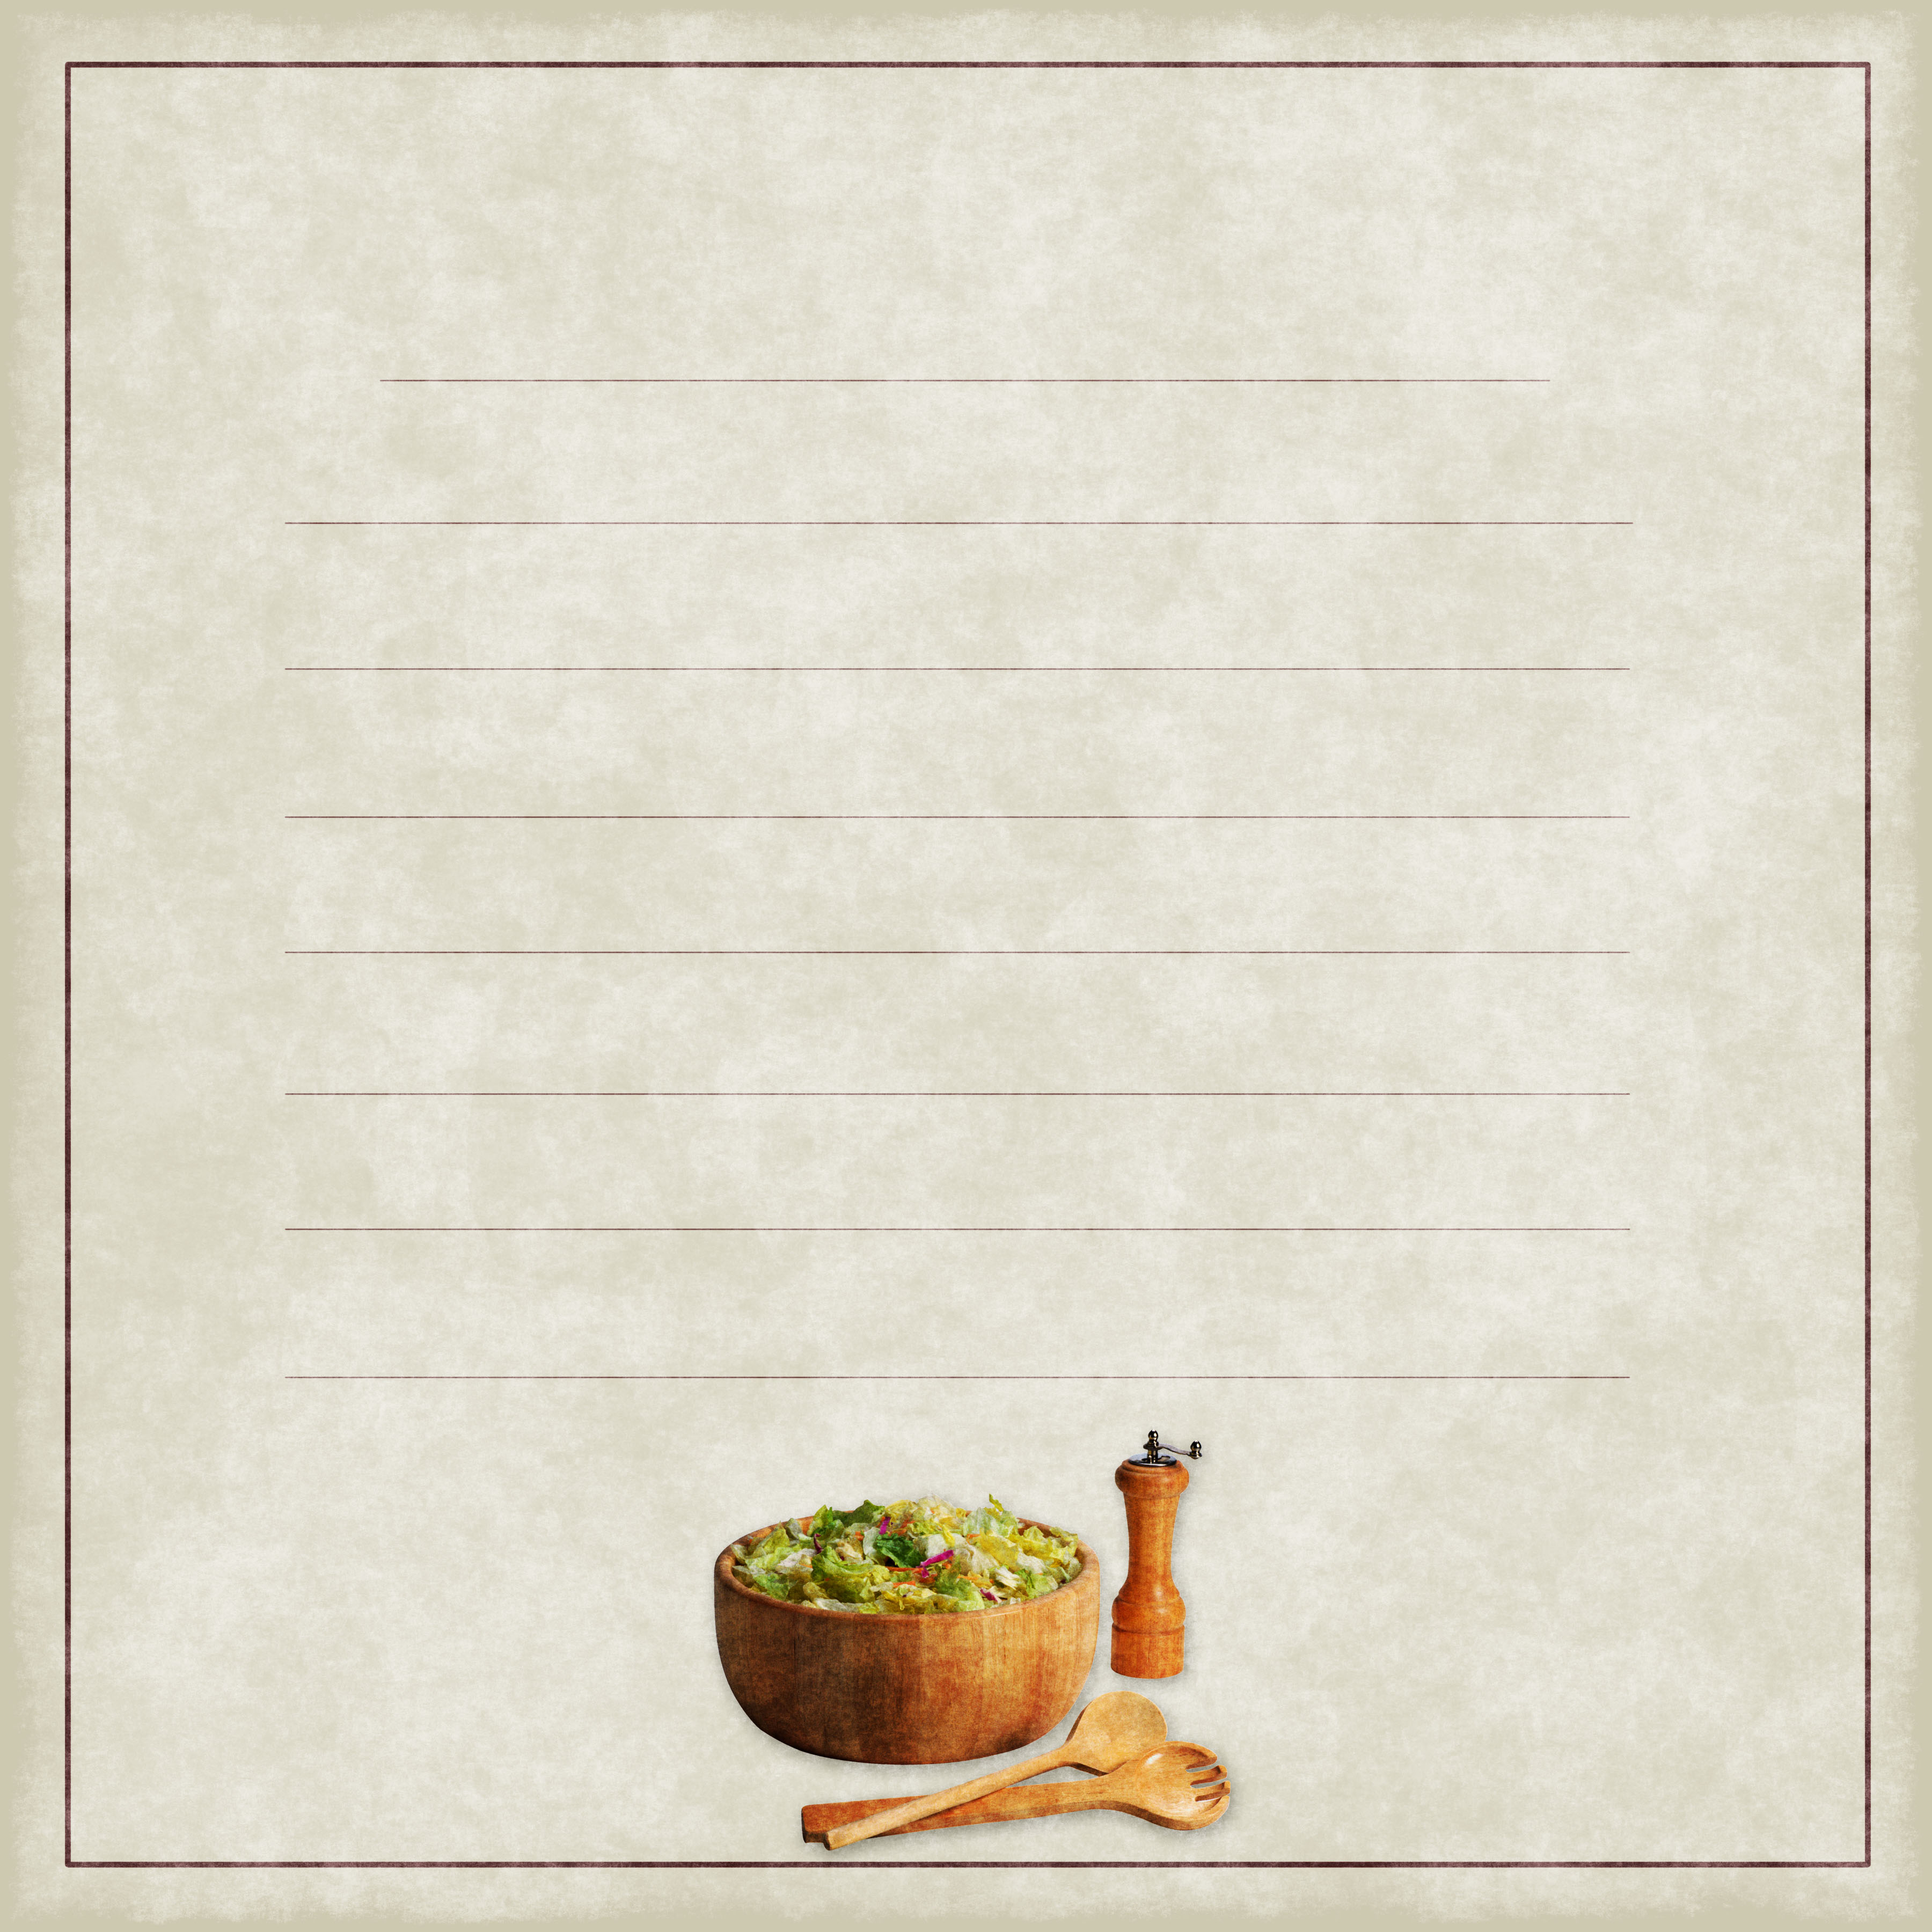 Книга рецептов картинка для презентации